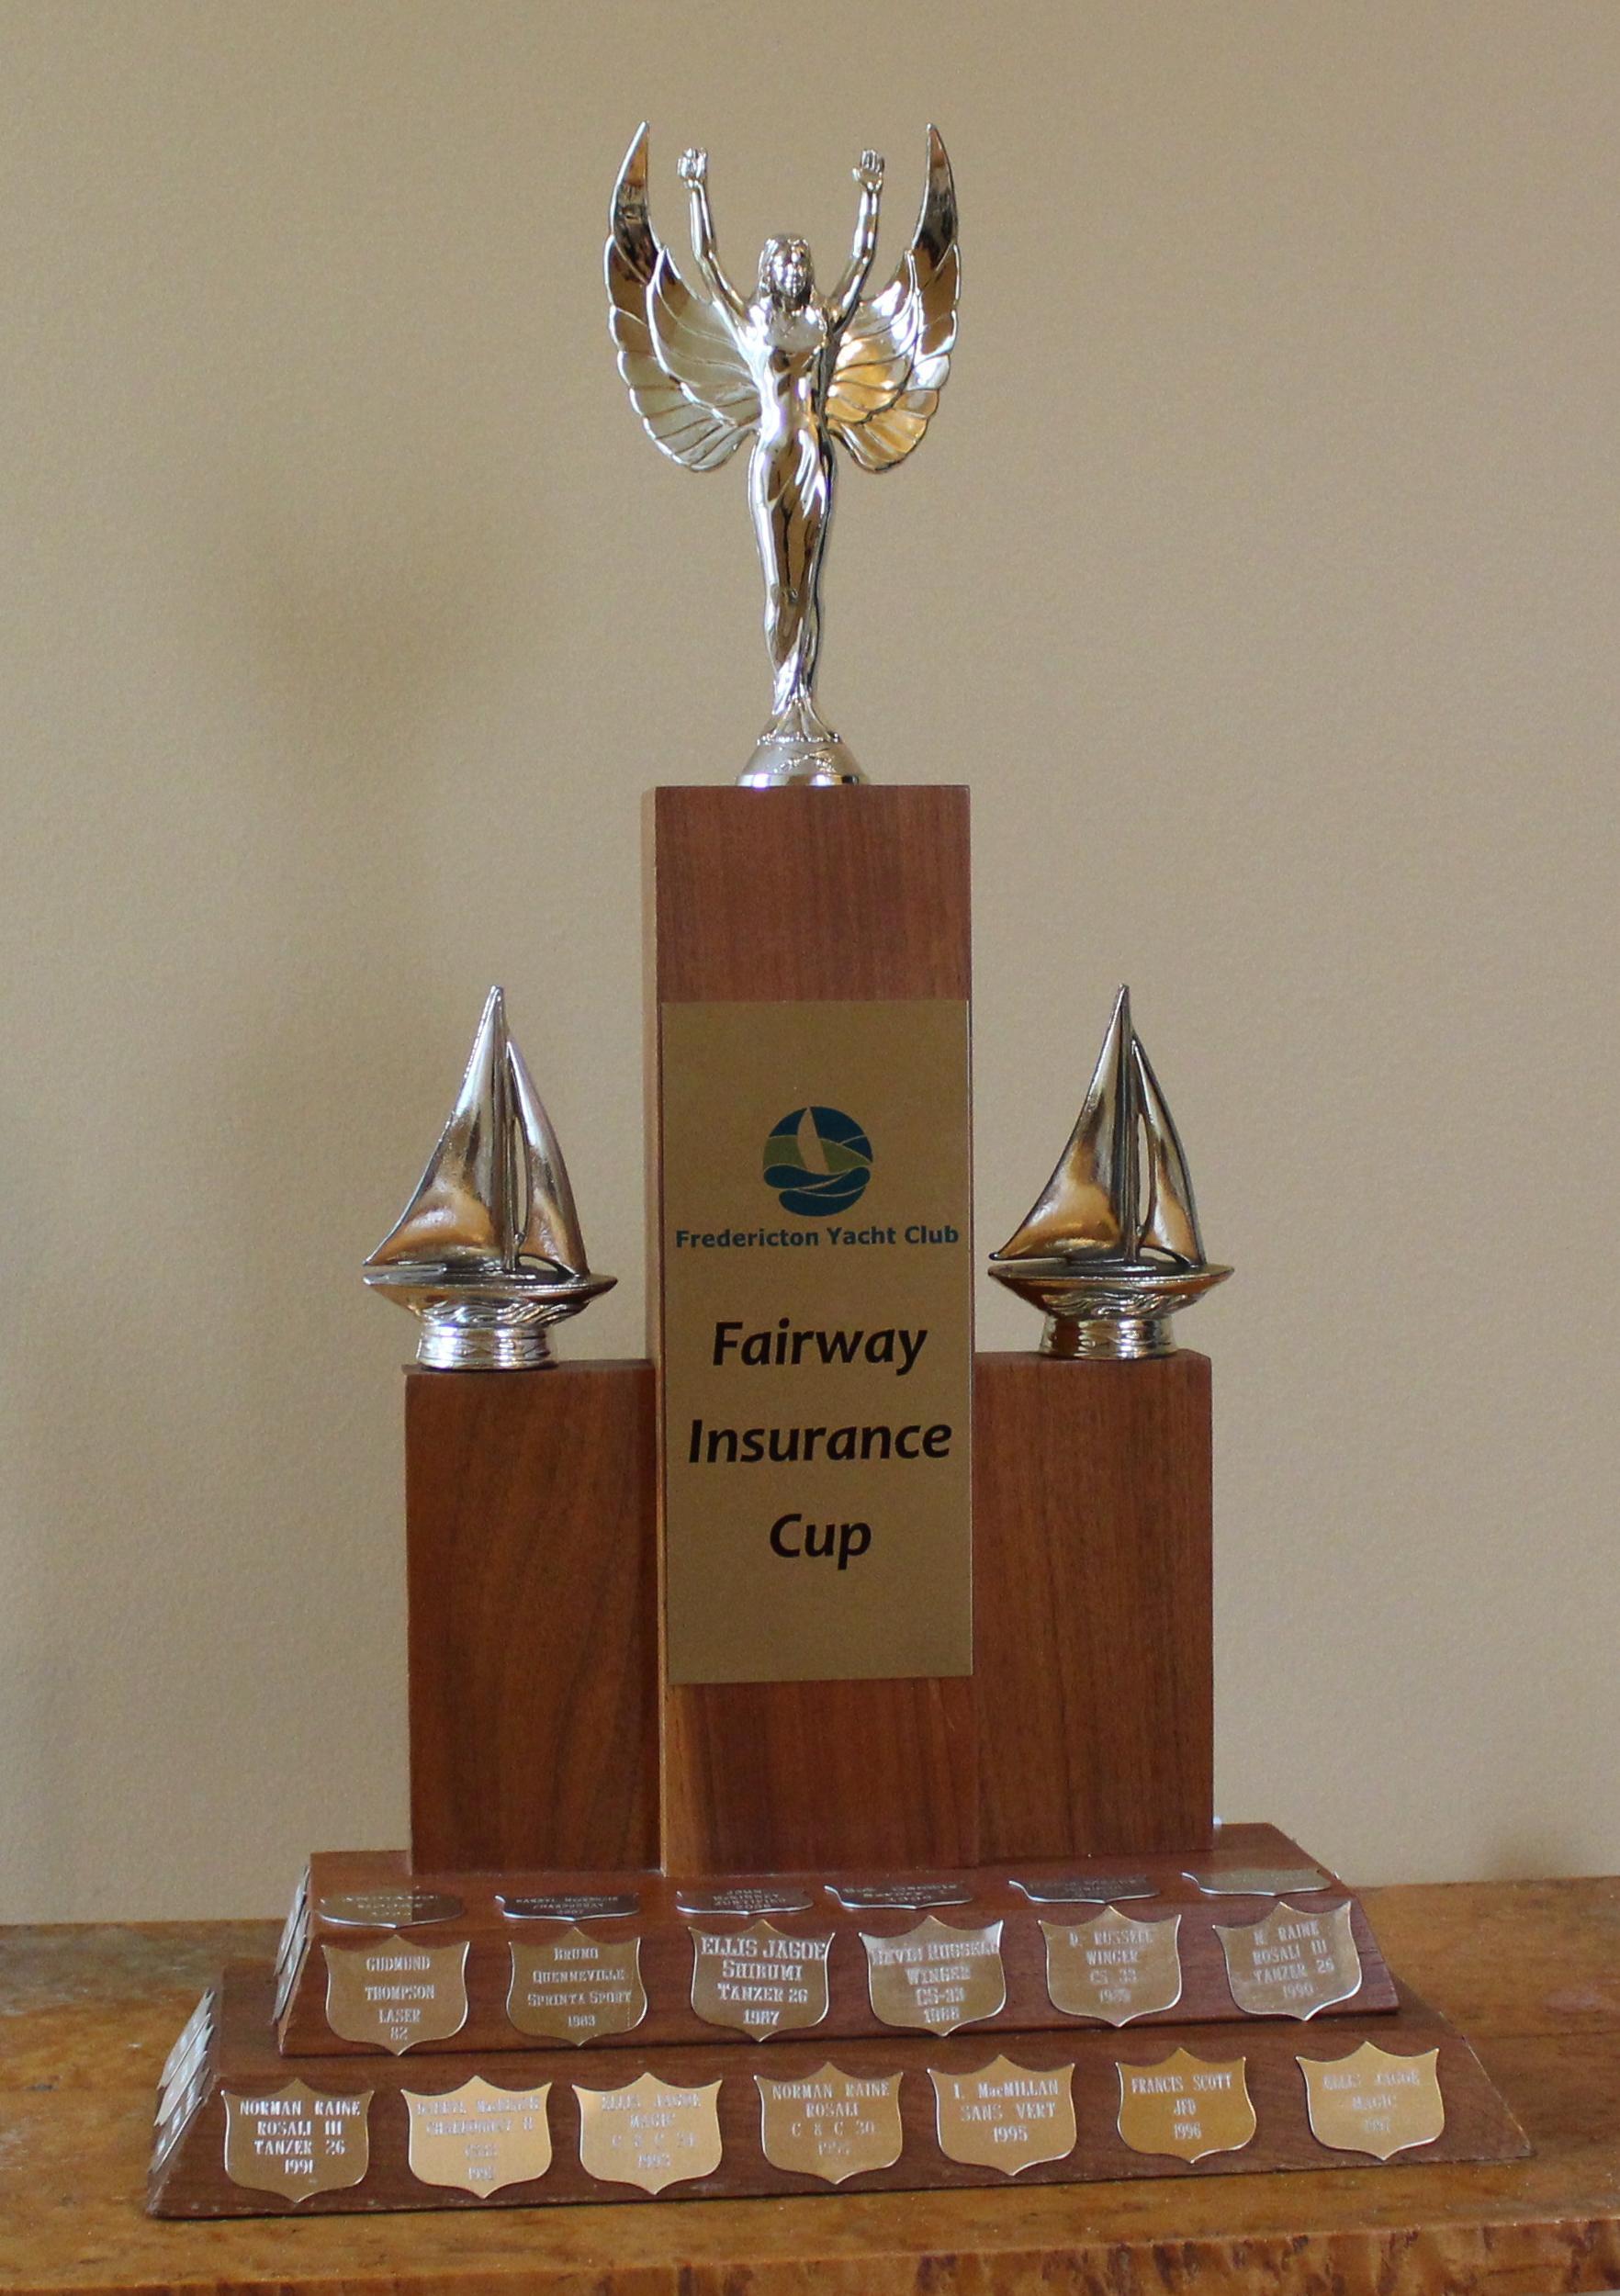 FYC-Fairway Cup